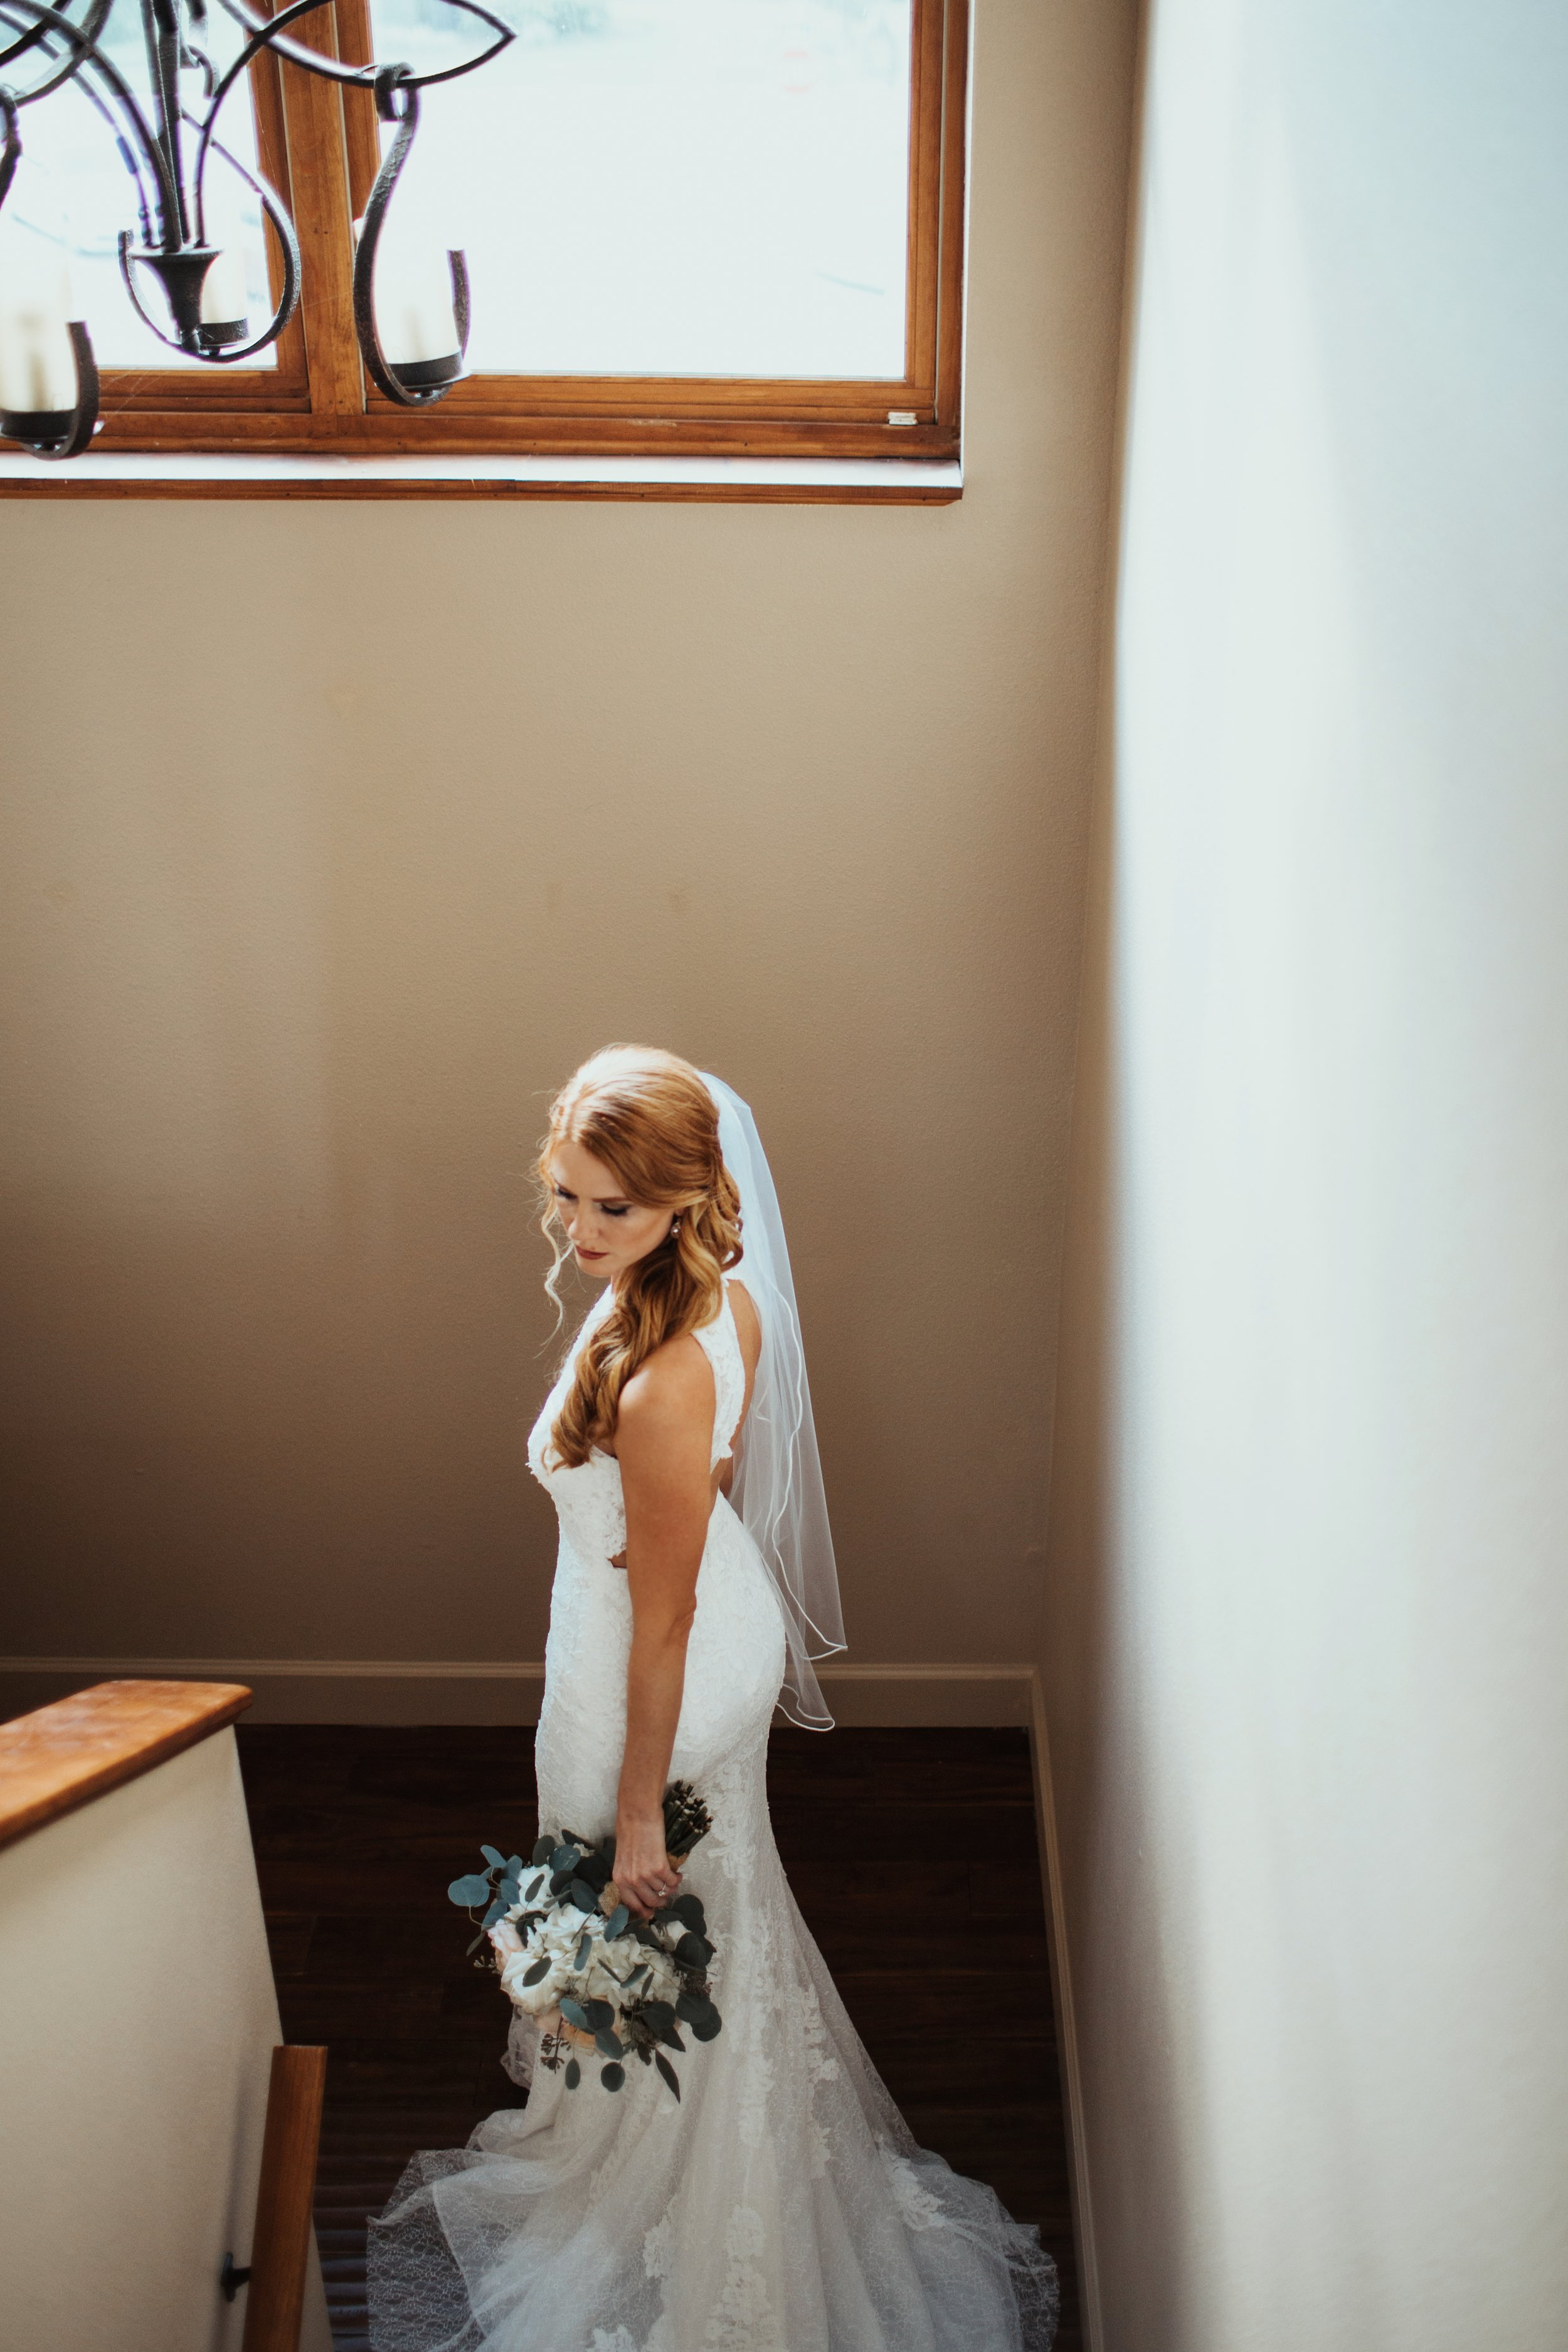 Wedding Day | Vanessa Boy | vanessaboy.com-445.com .jpg